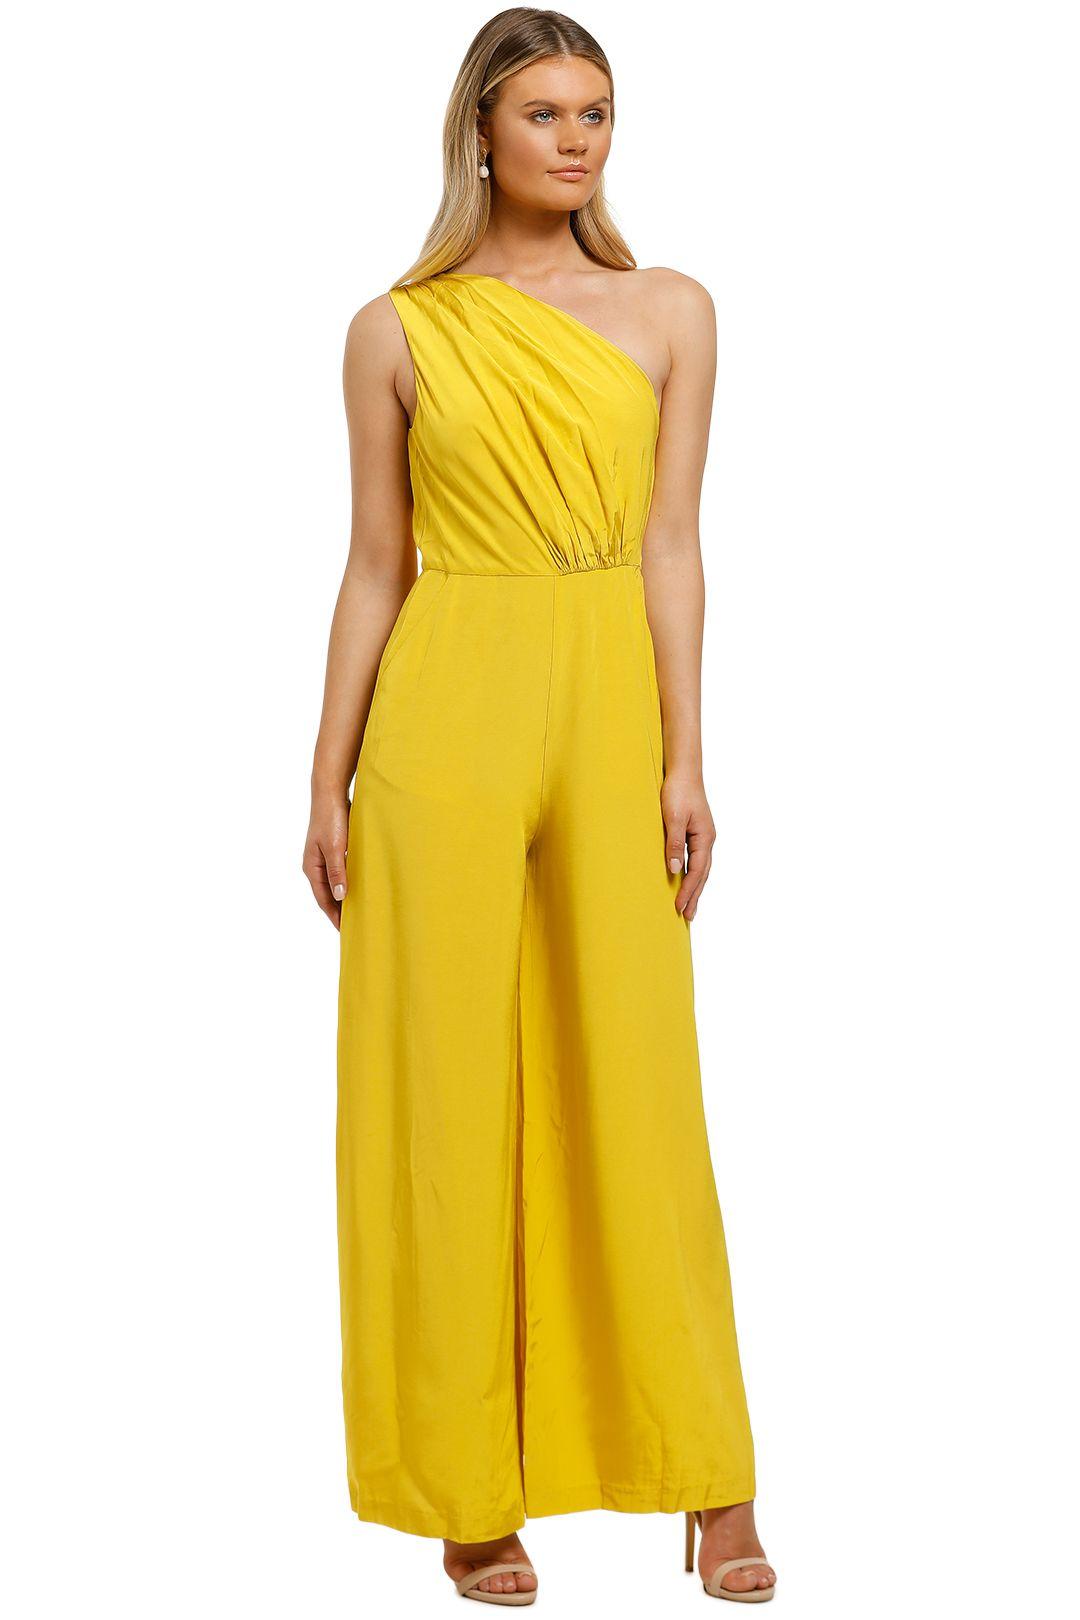 Vestire-Pretty-Hurts-Jumpsuit-Mustard-Side